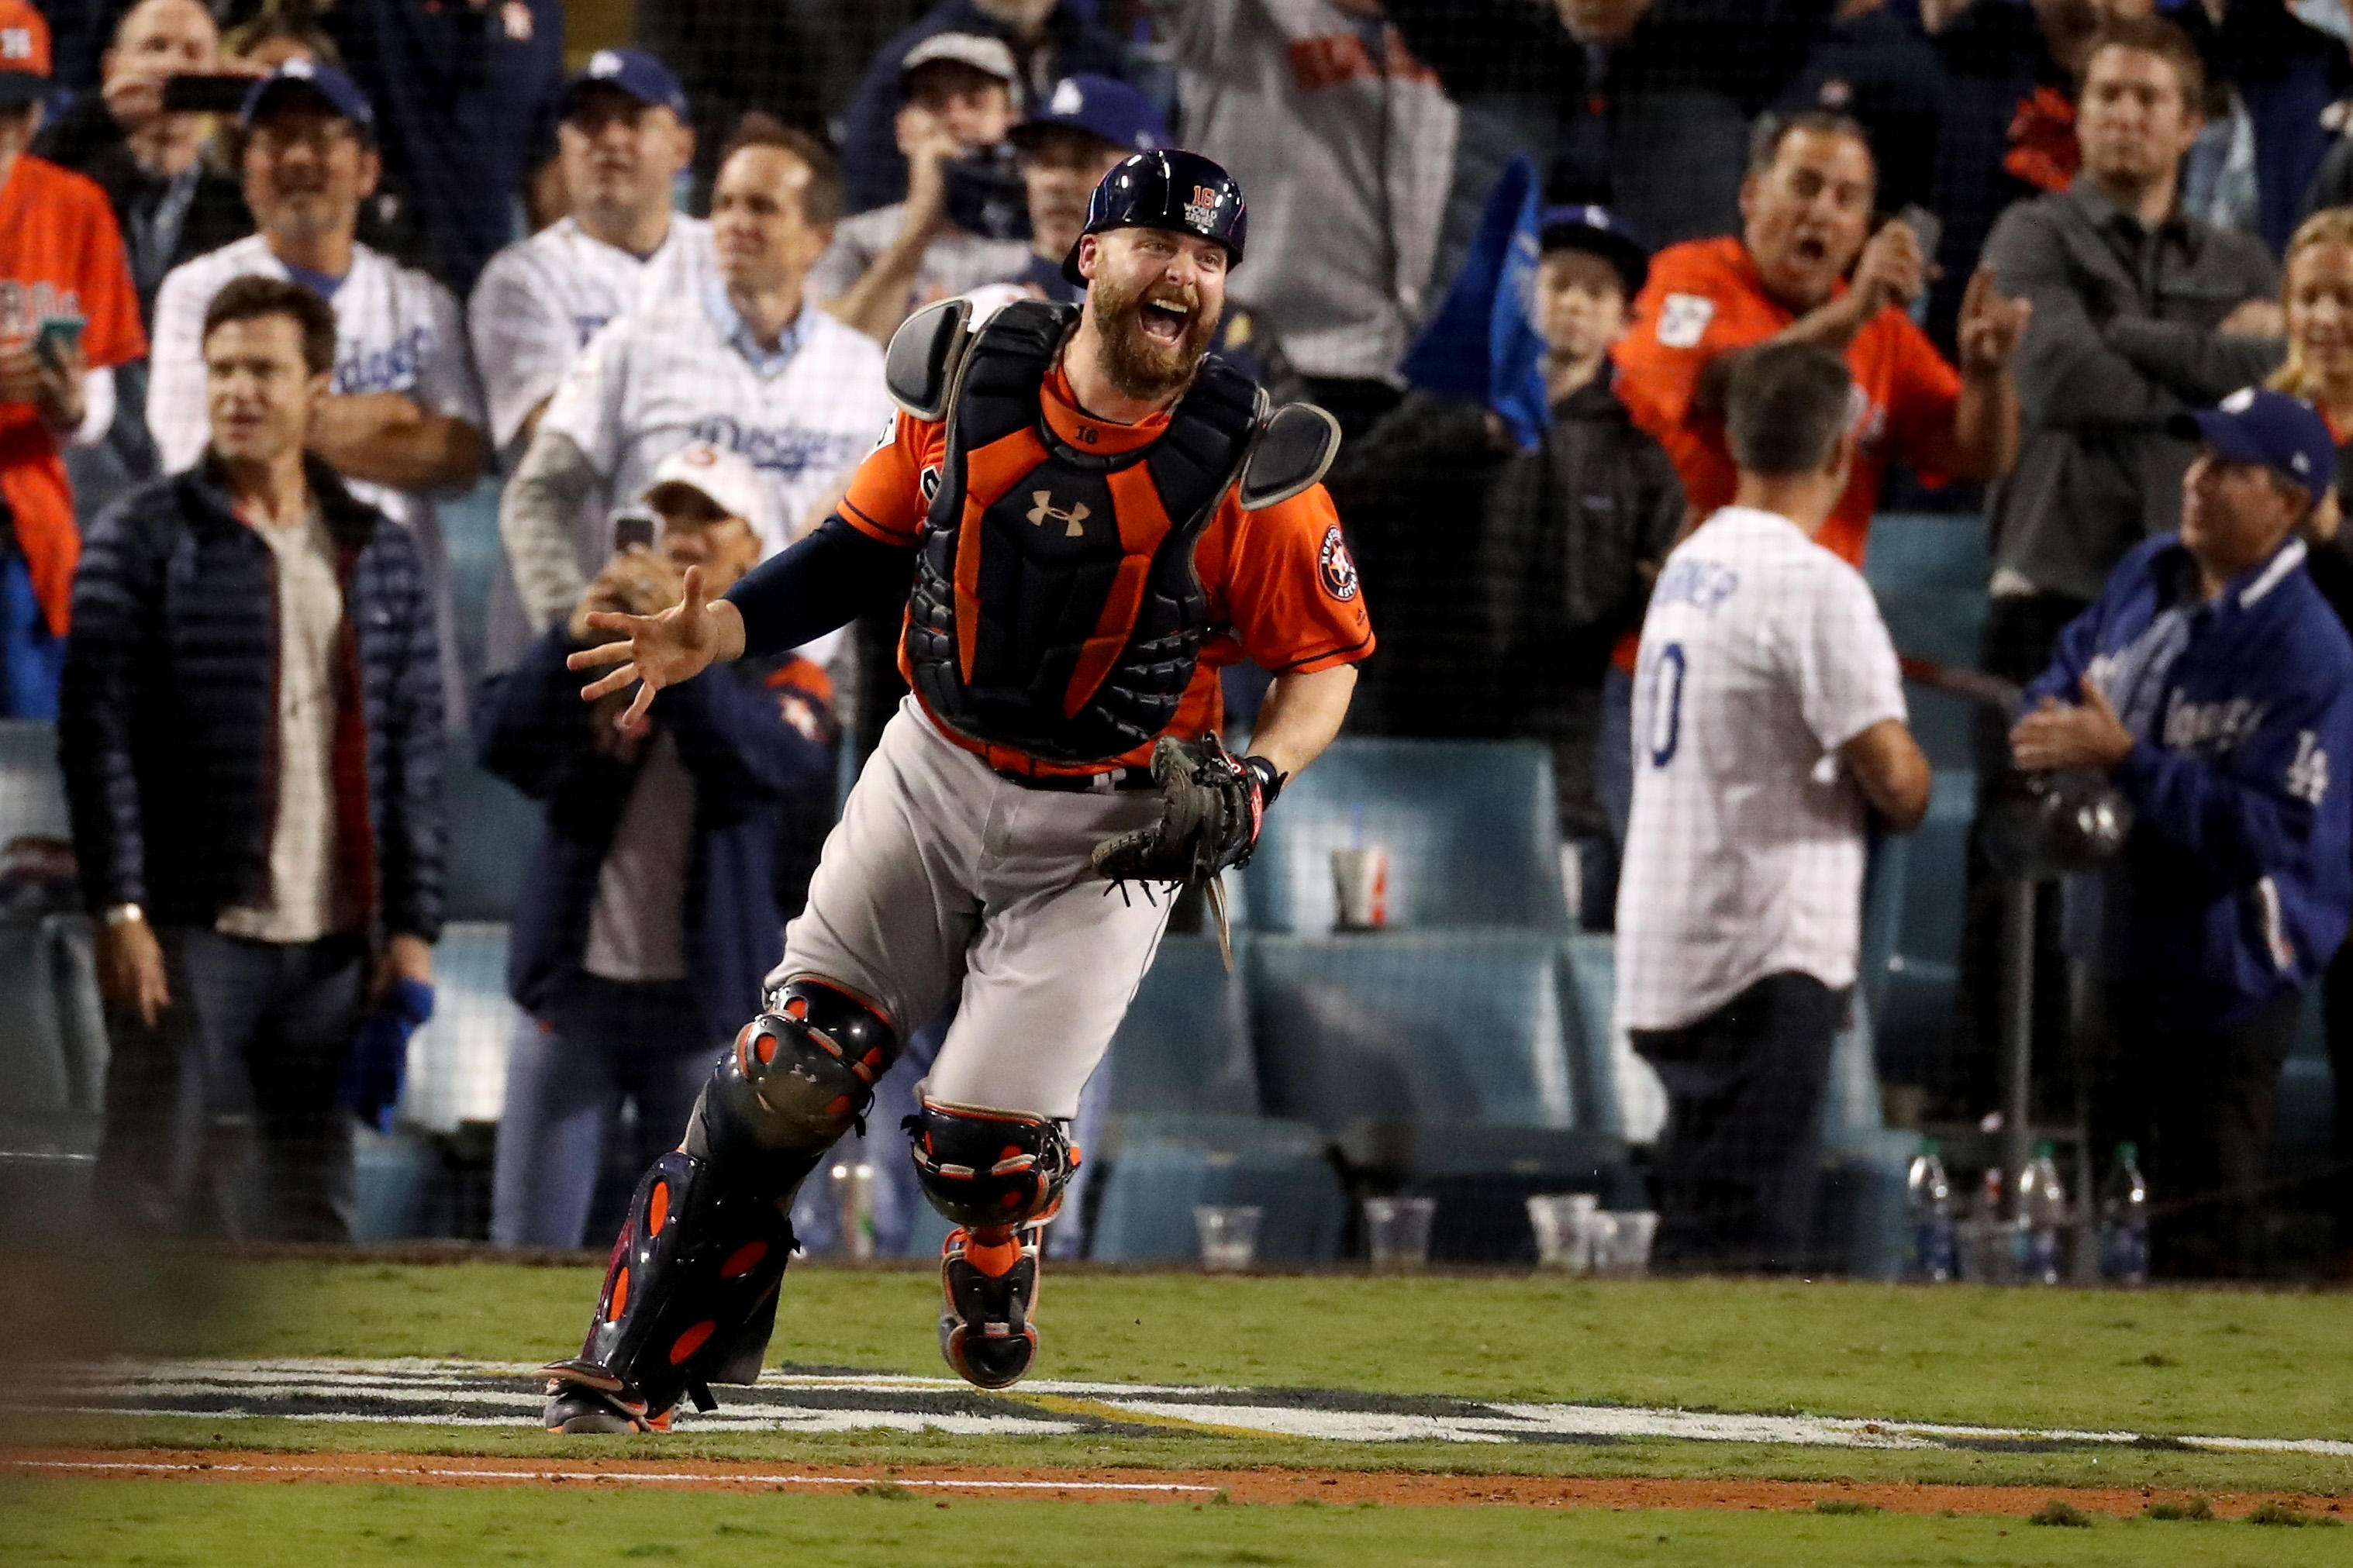 24240802d1cd2e heraldonline.com Astros defeat Dodgers 5-1 for first-ever World Series title